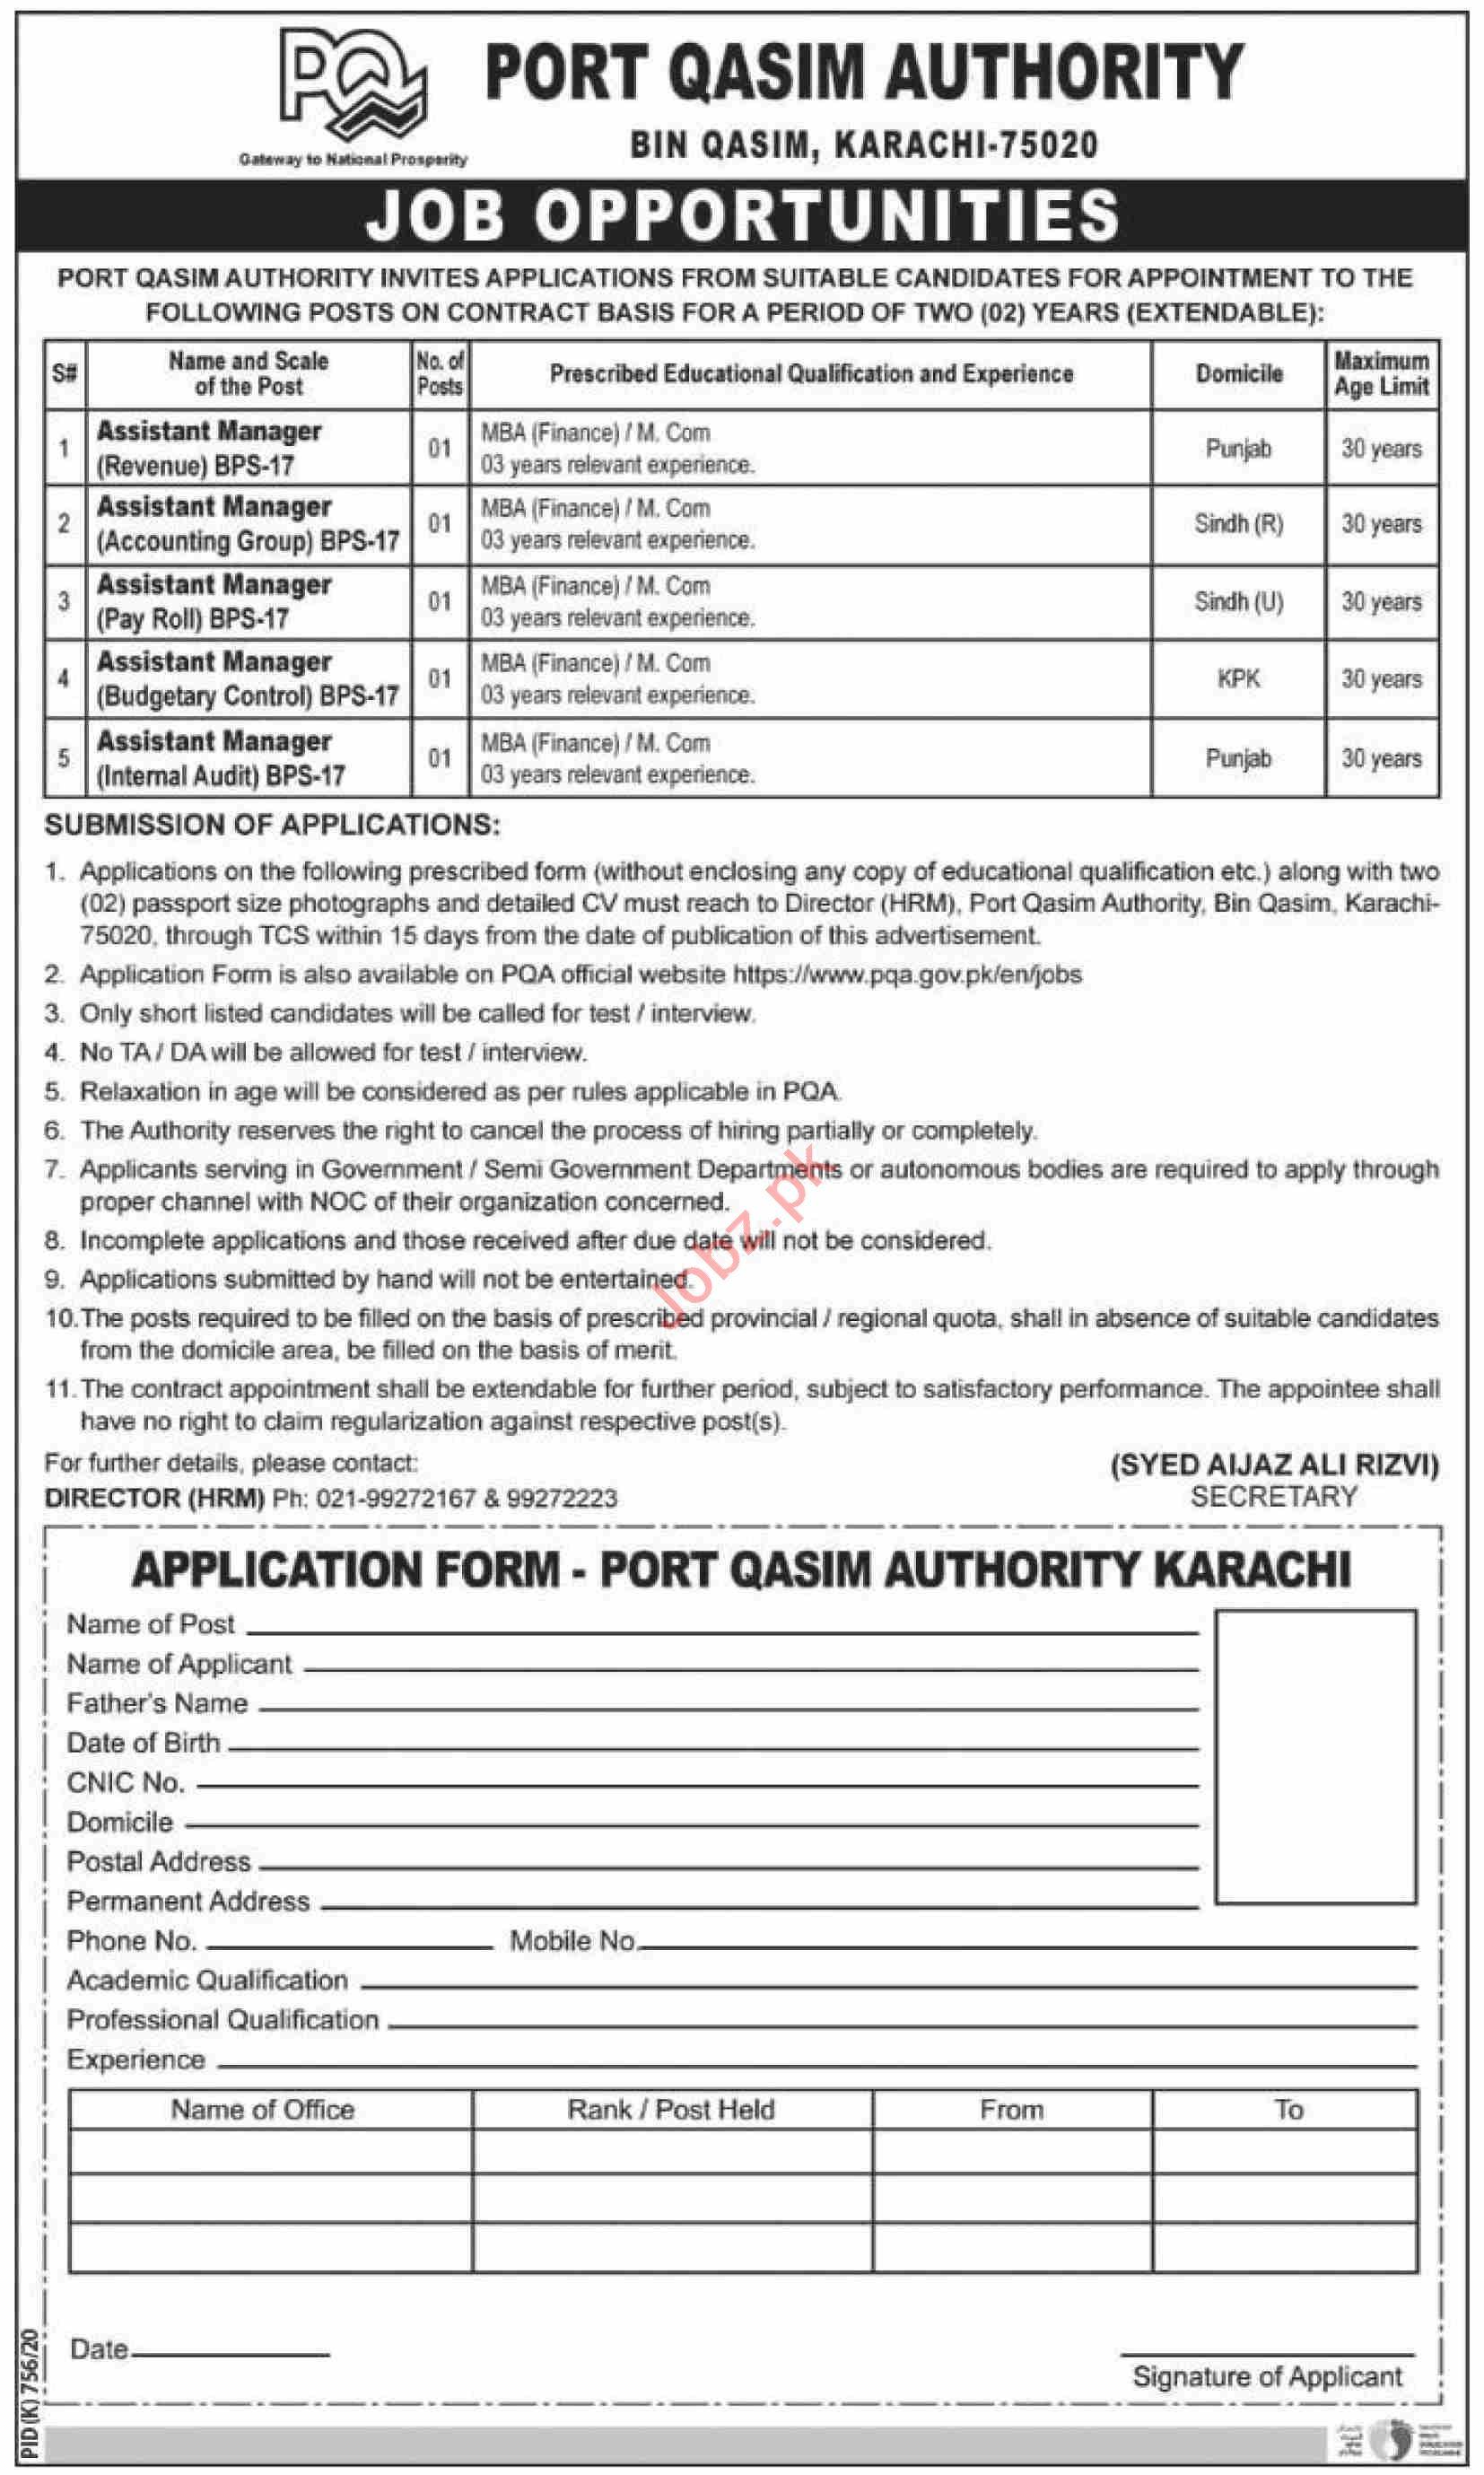 Port Qasim Authority PQA Karachi Jobs 2020 for Managers